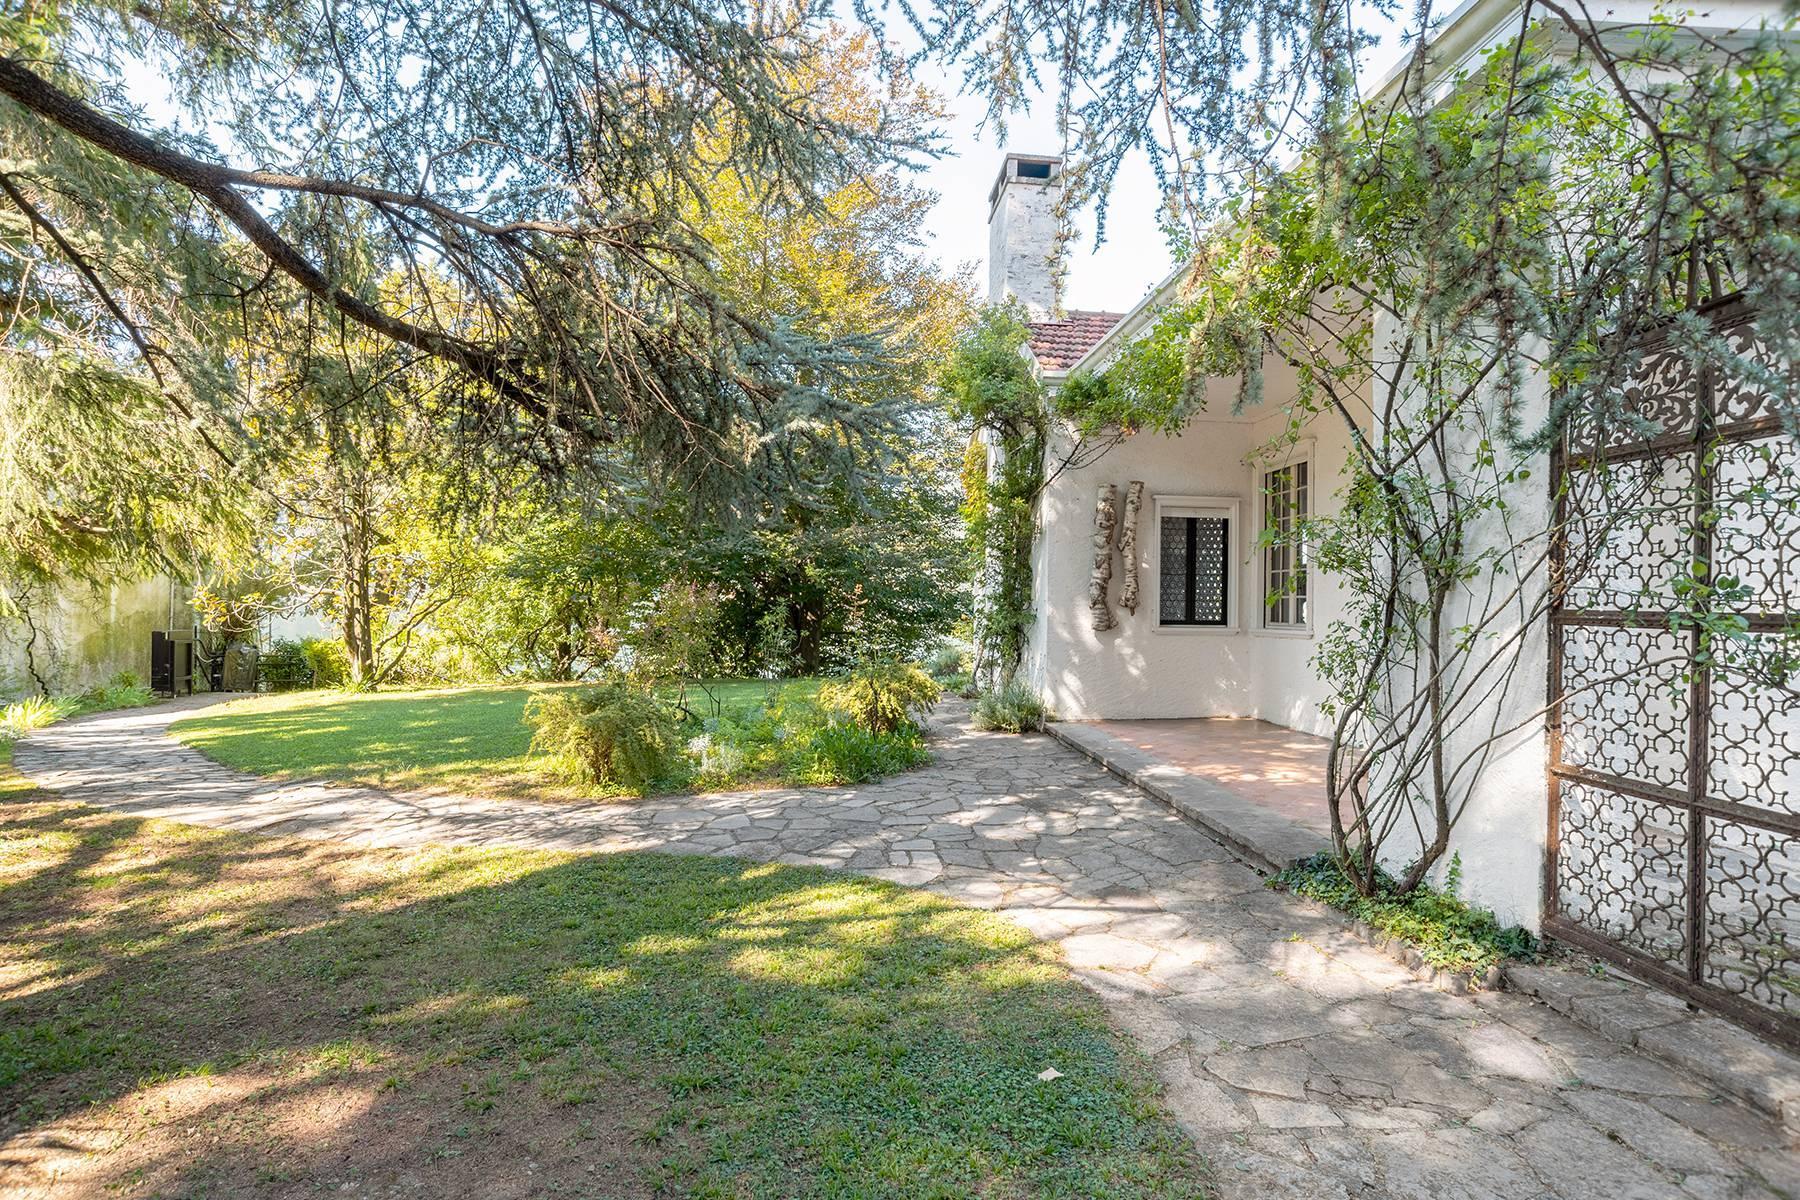 Splendida villa d'epoca con vista lago mozzafiato - 8